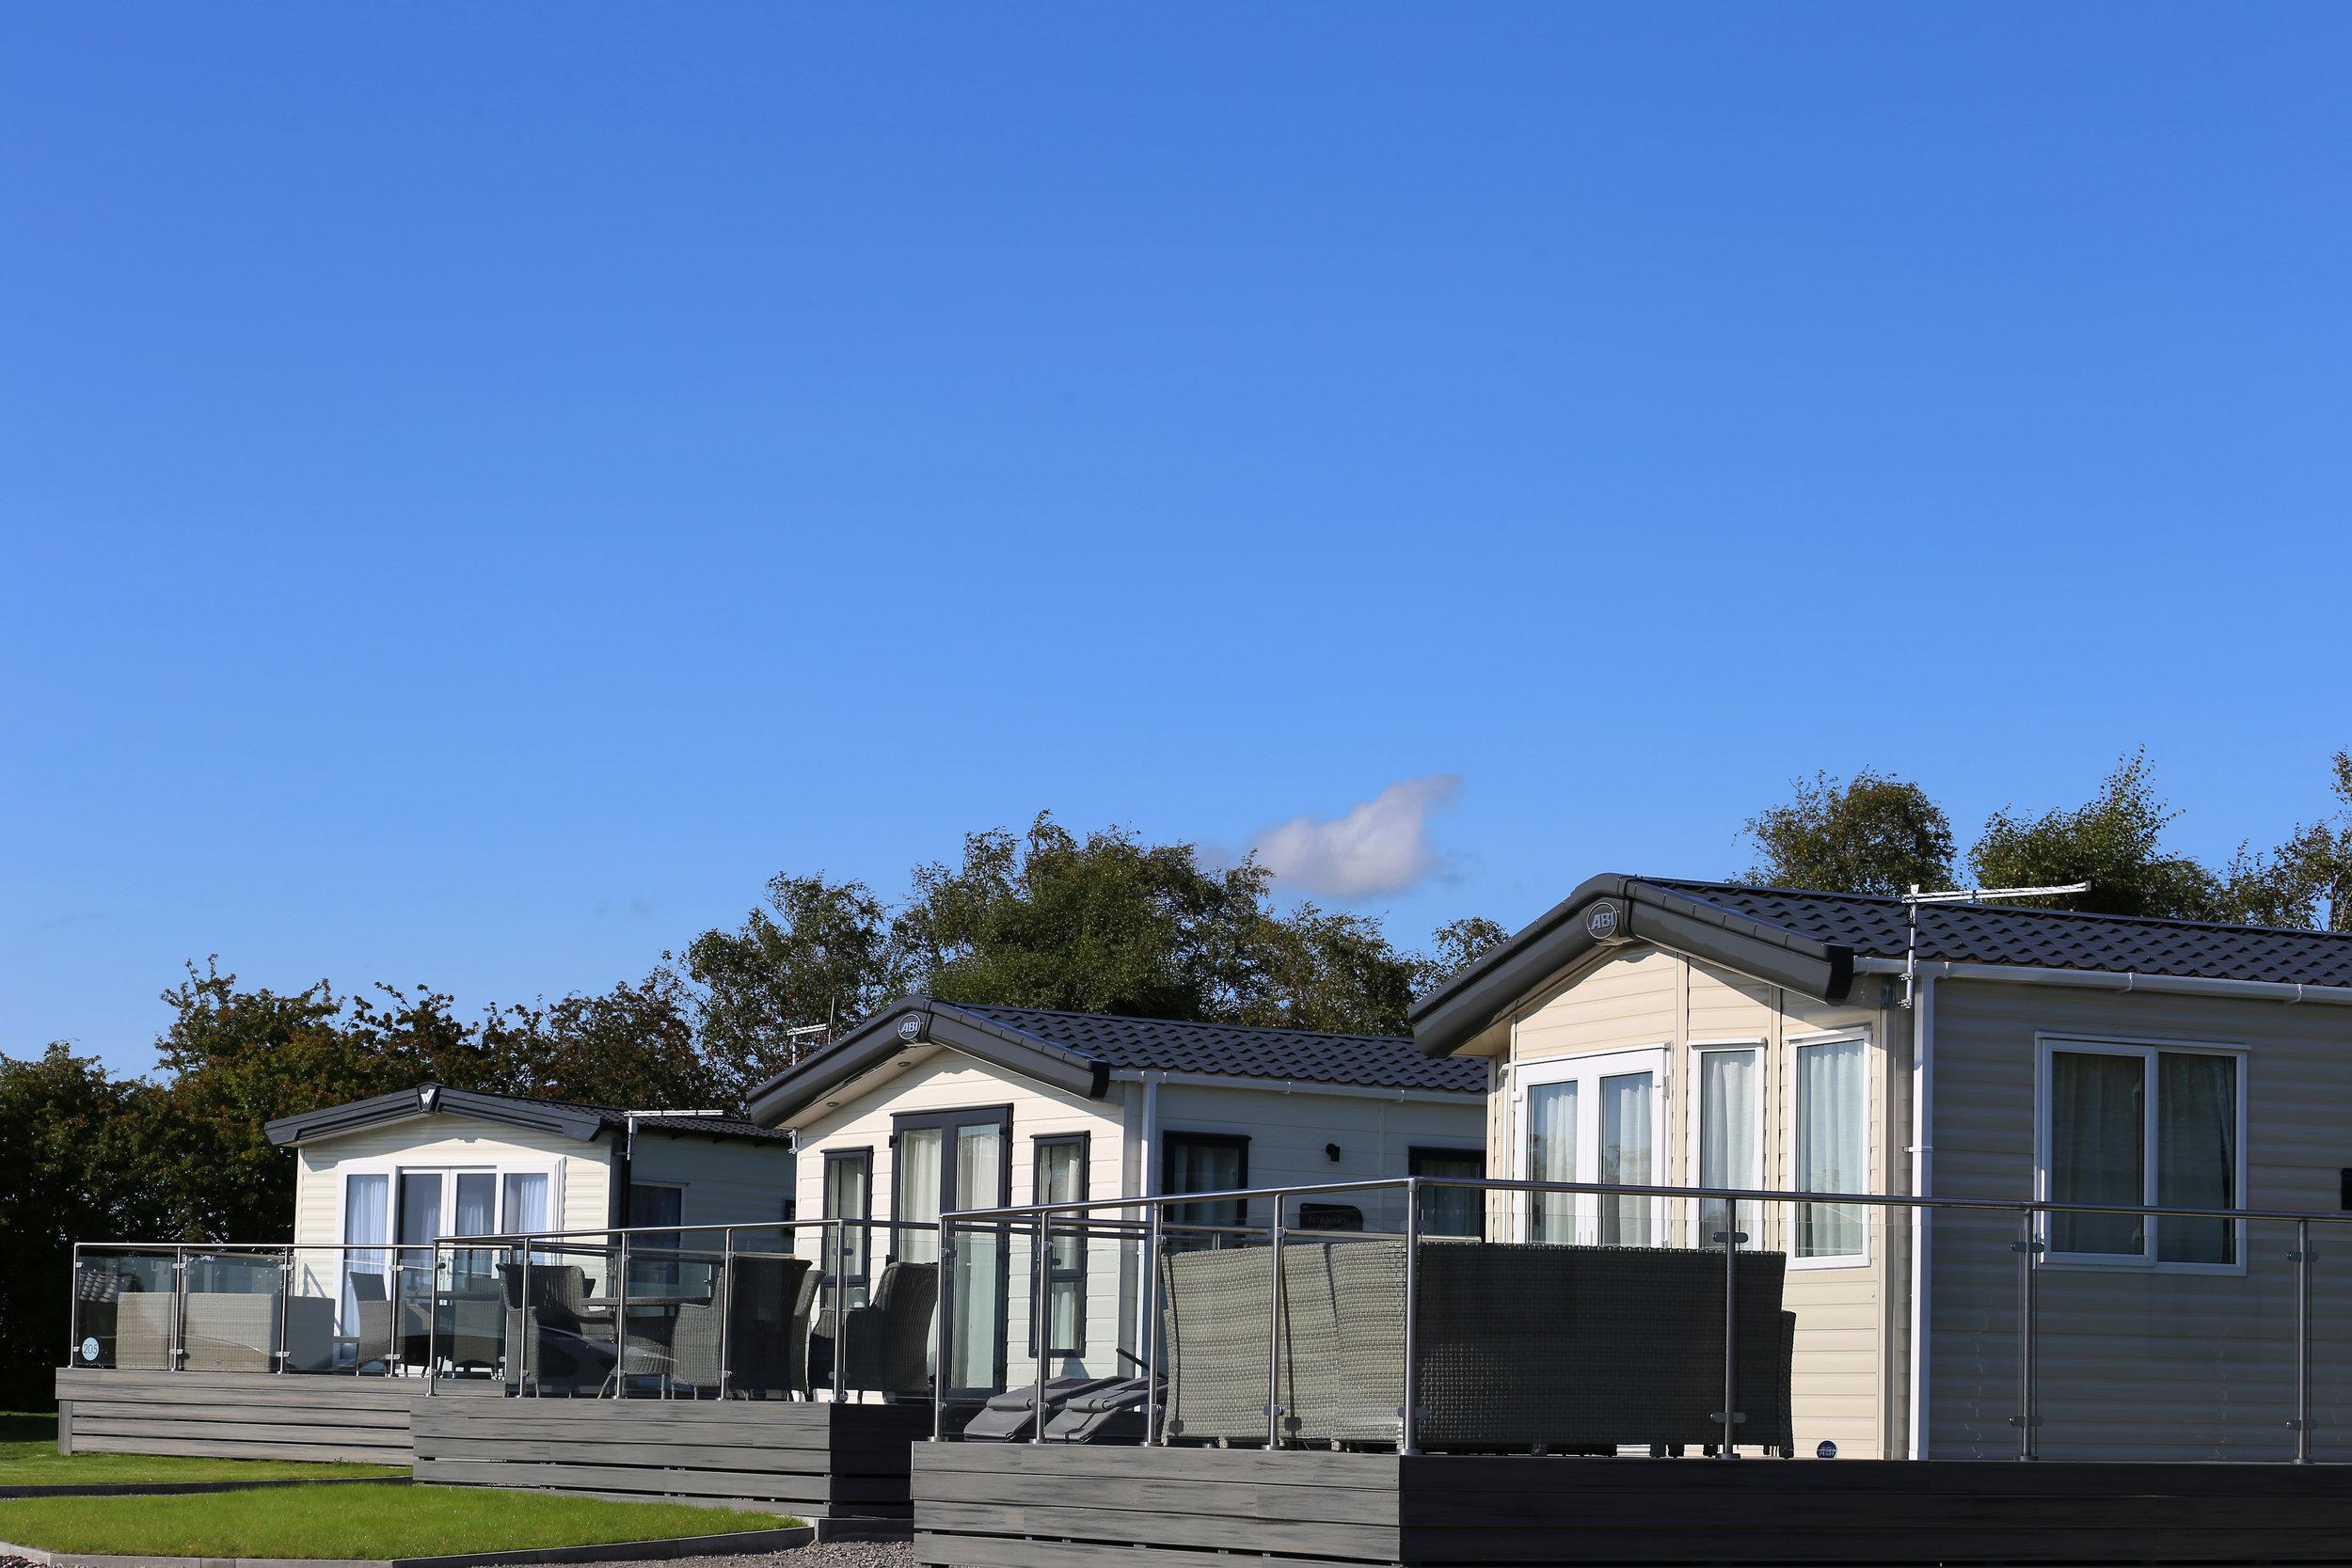 36 - Three Holiday Homes.JPG